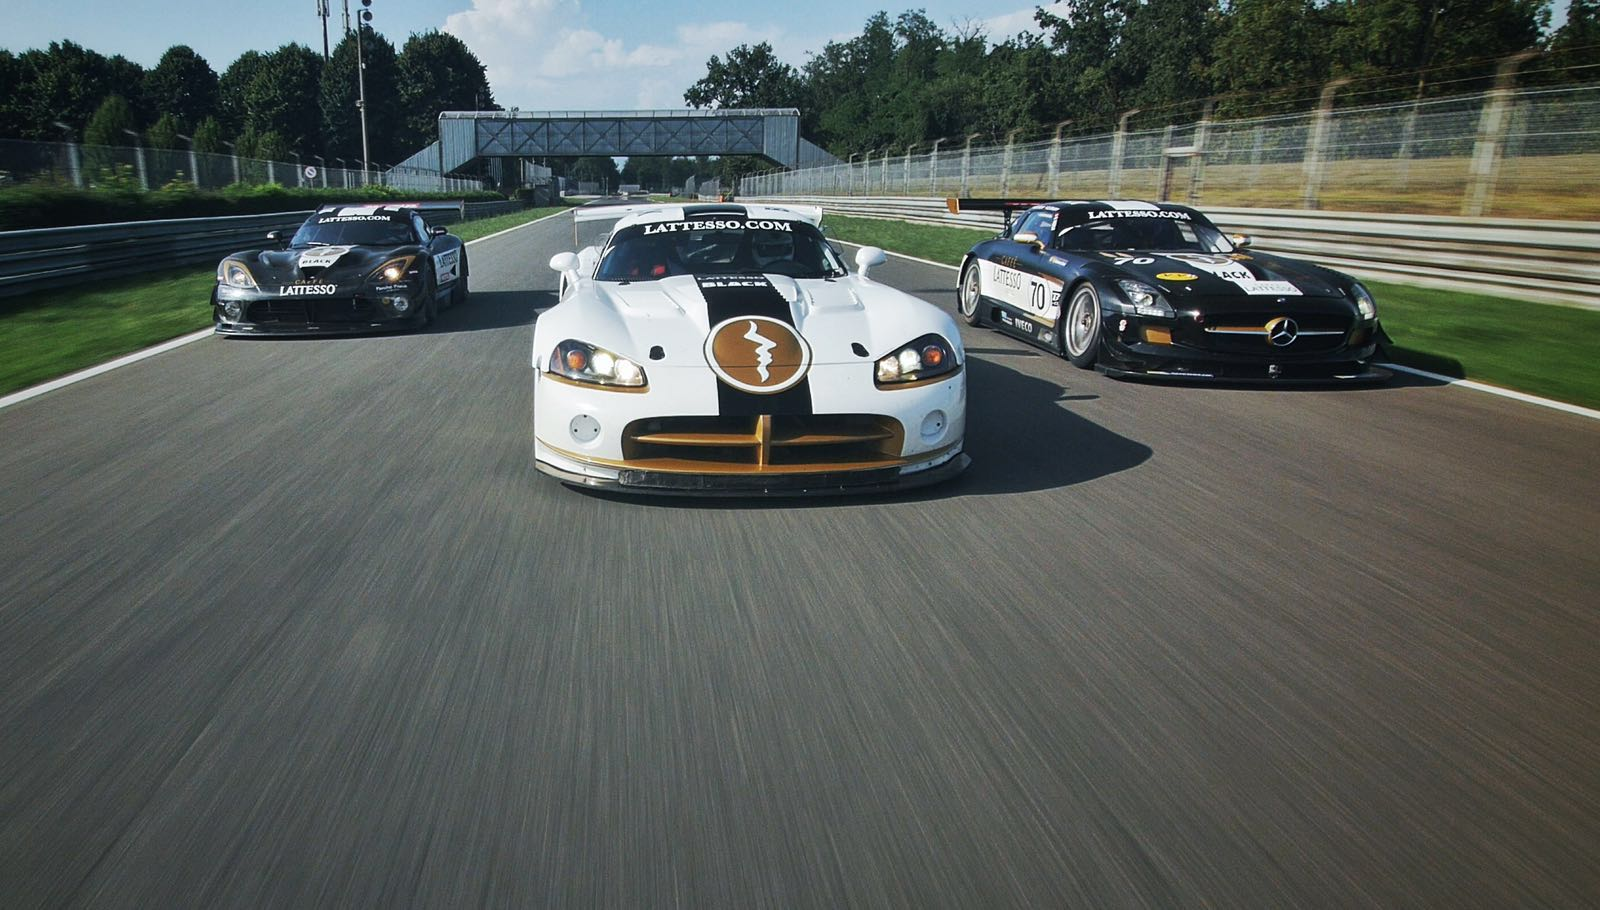 Viper / SLS auf dem Race Track